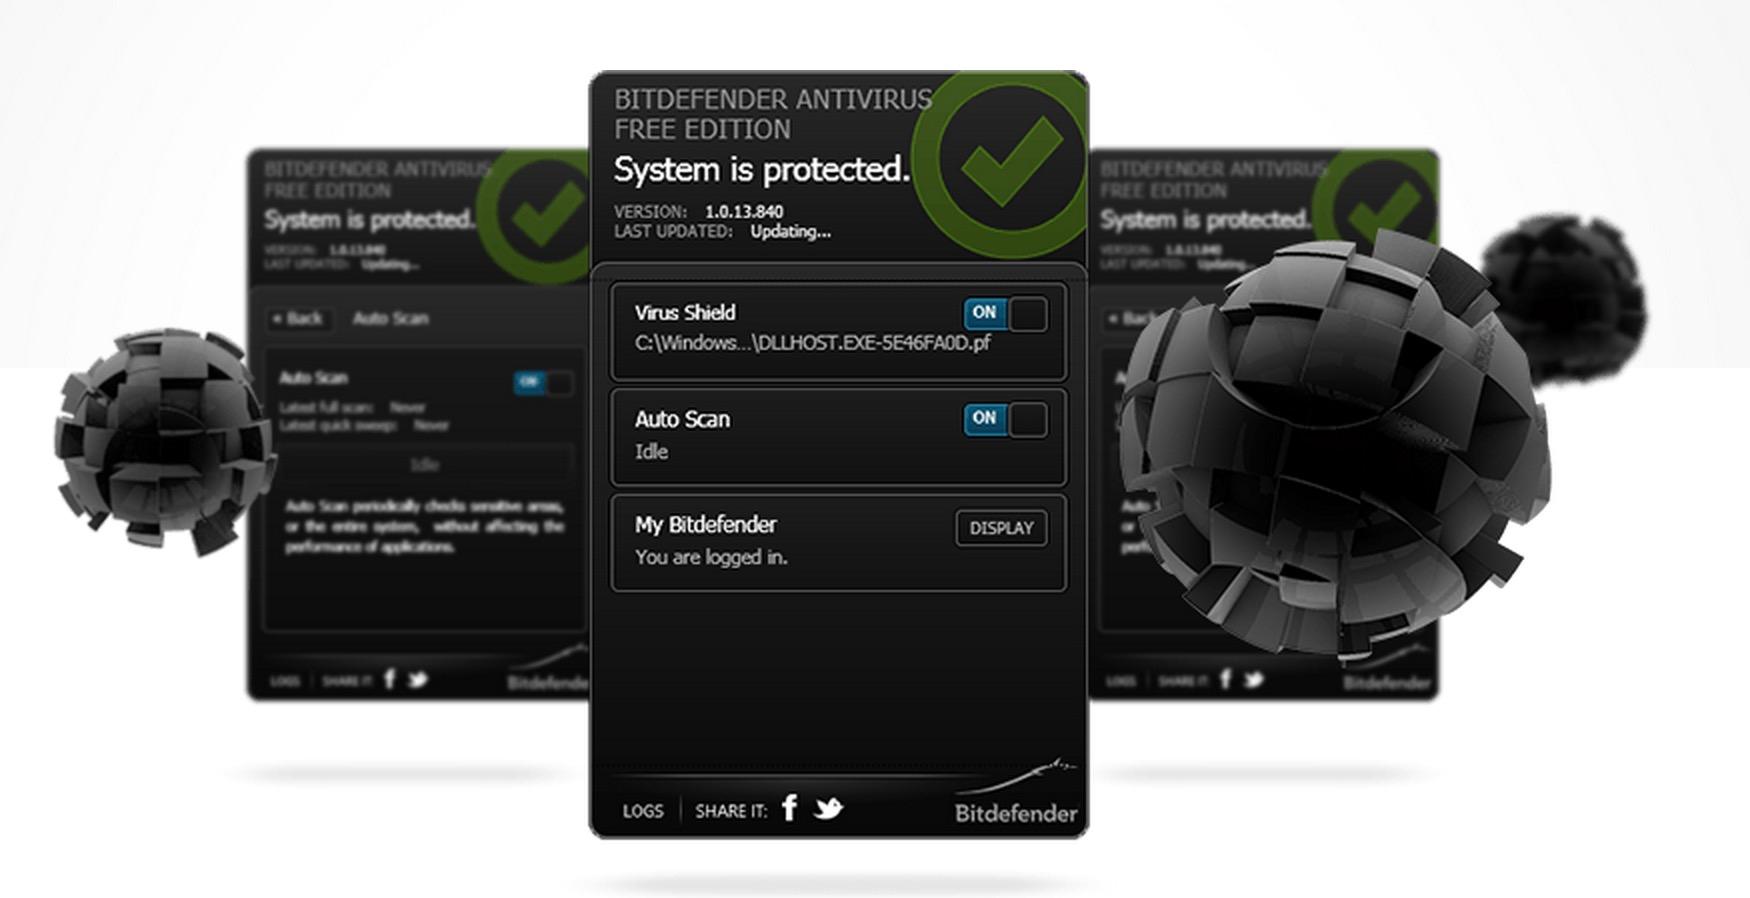 Best Free Antivirus For 2015